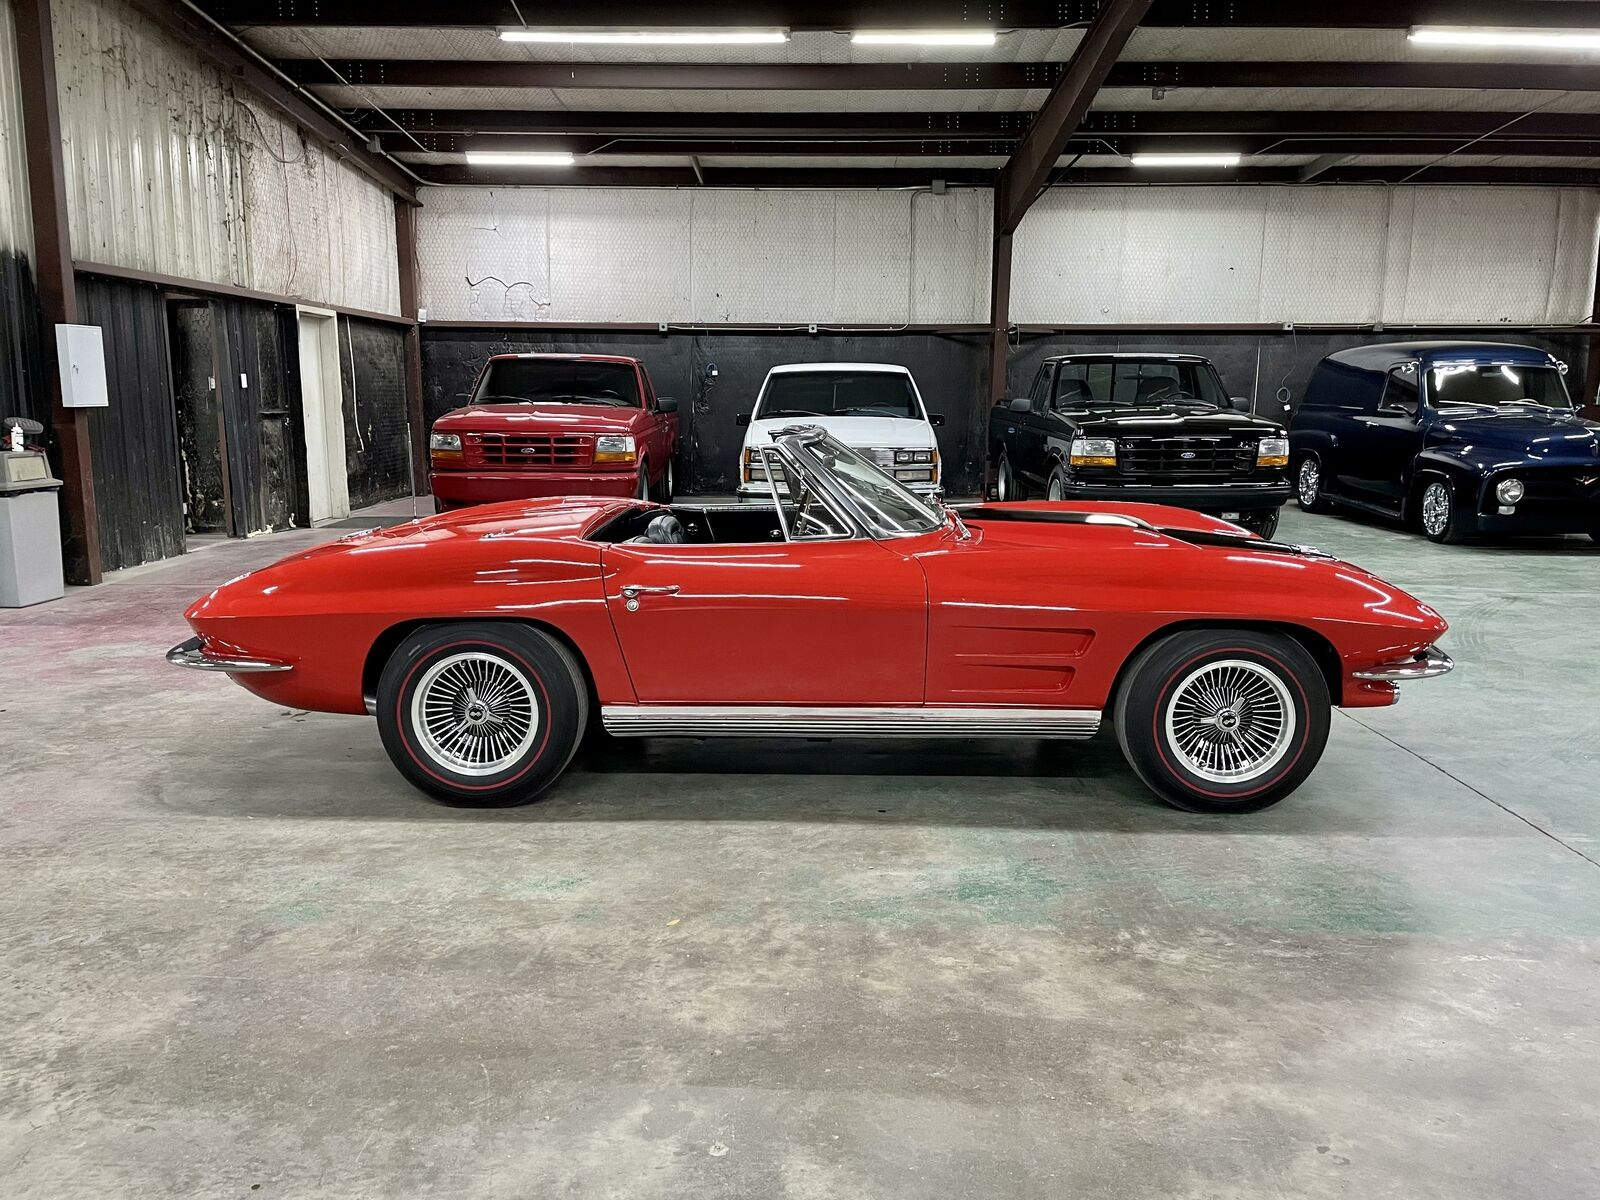 1964 Red Chevrolet Corvette   | C2 Corvette Photo 6